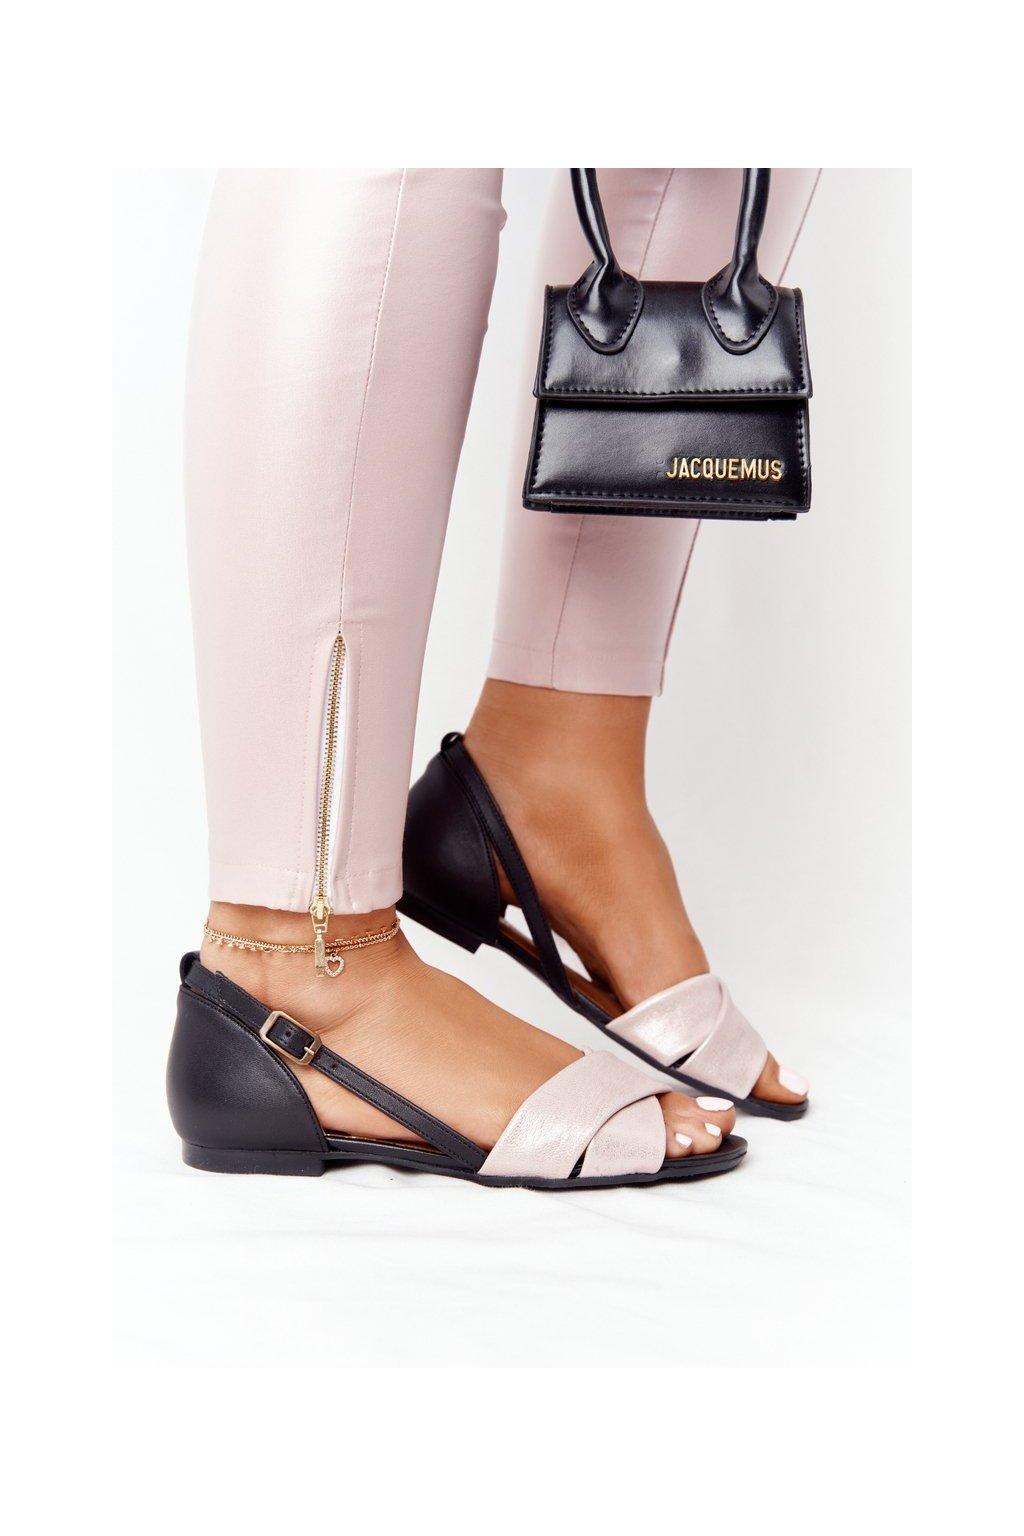 Dámske sandále s plochou podrážkou farba čierna kód obuvi 04614-15/00-5 METALICZNY RÓŻ CZARNY